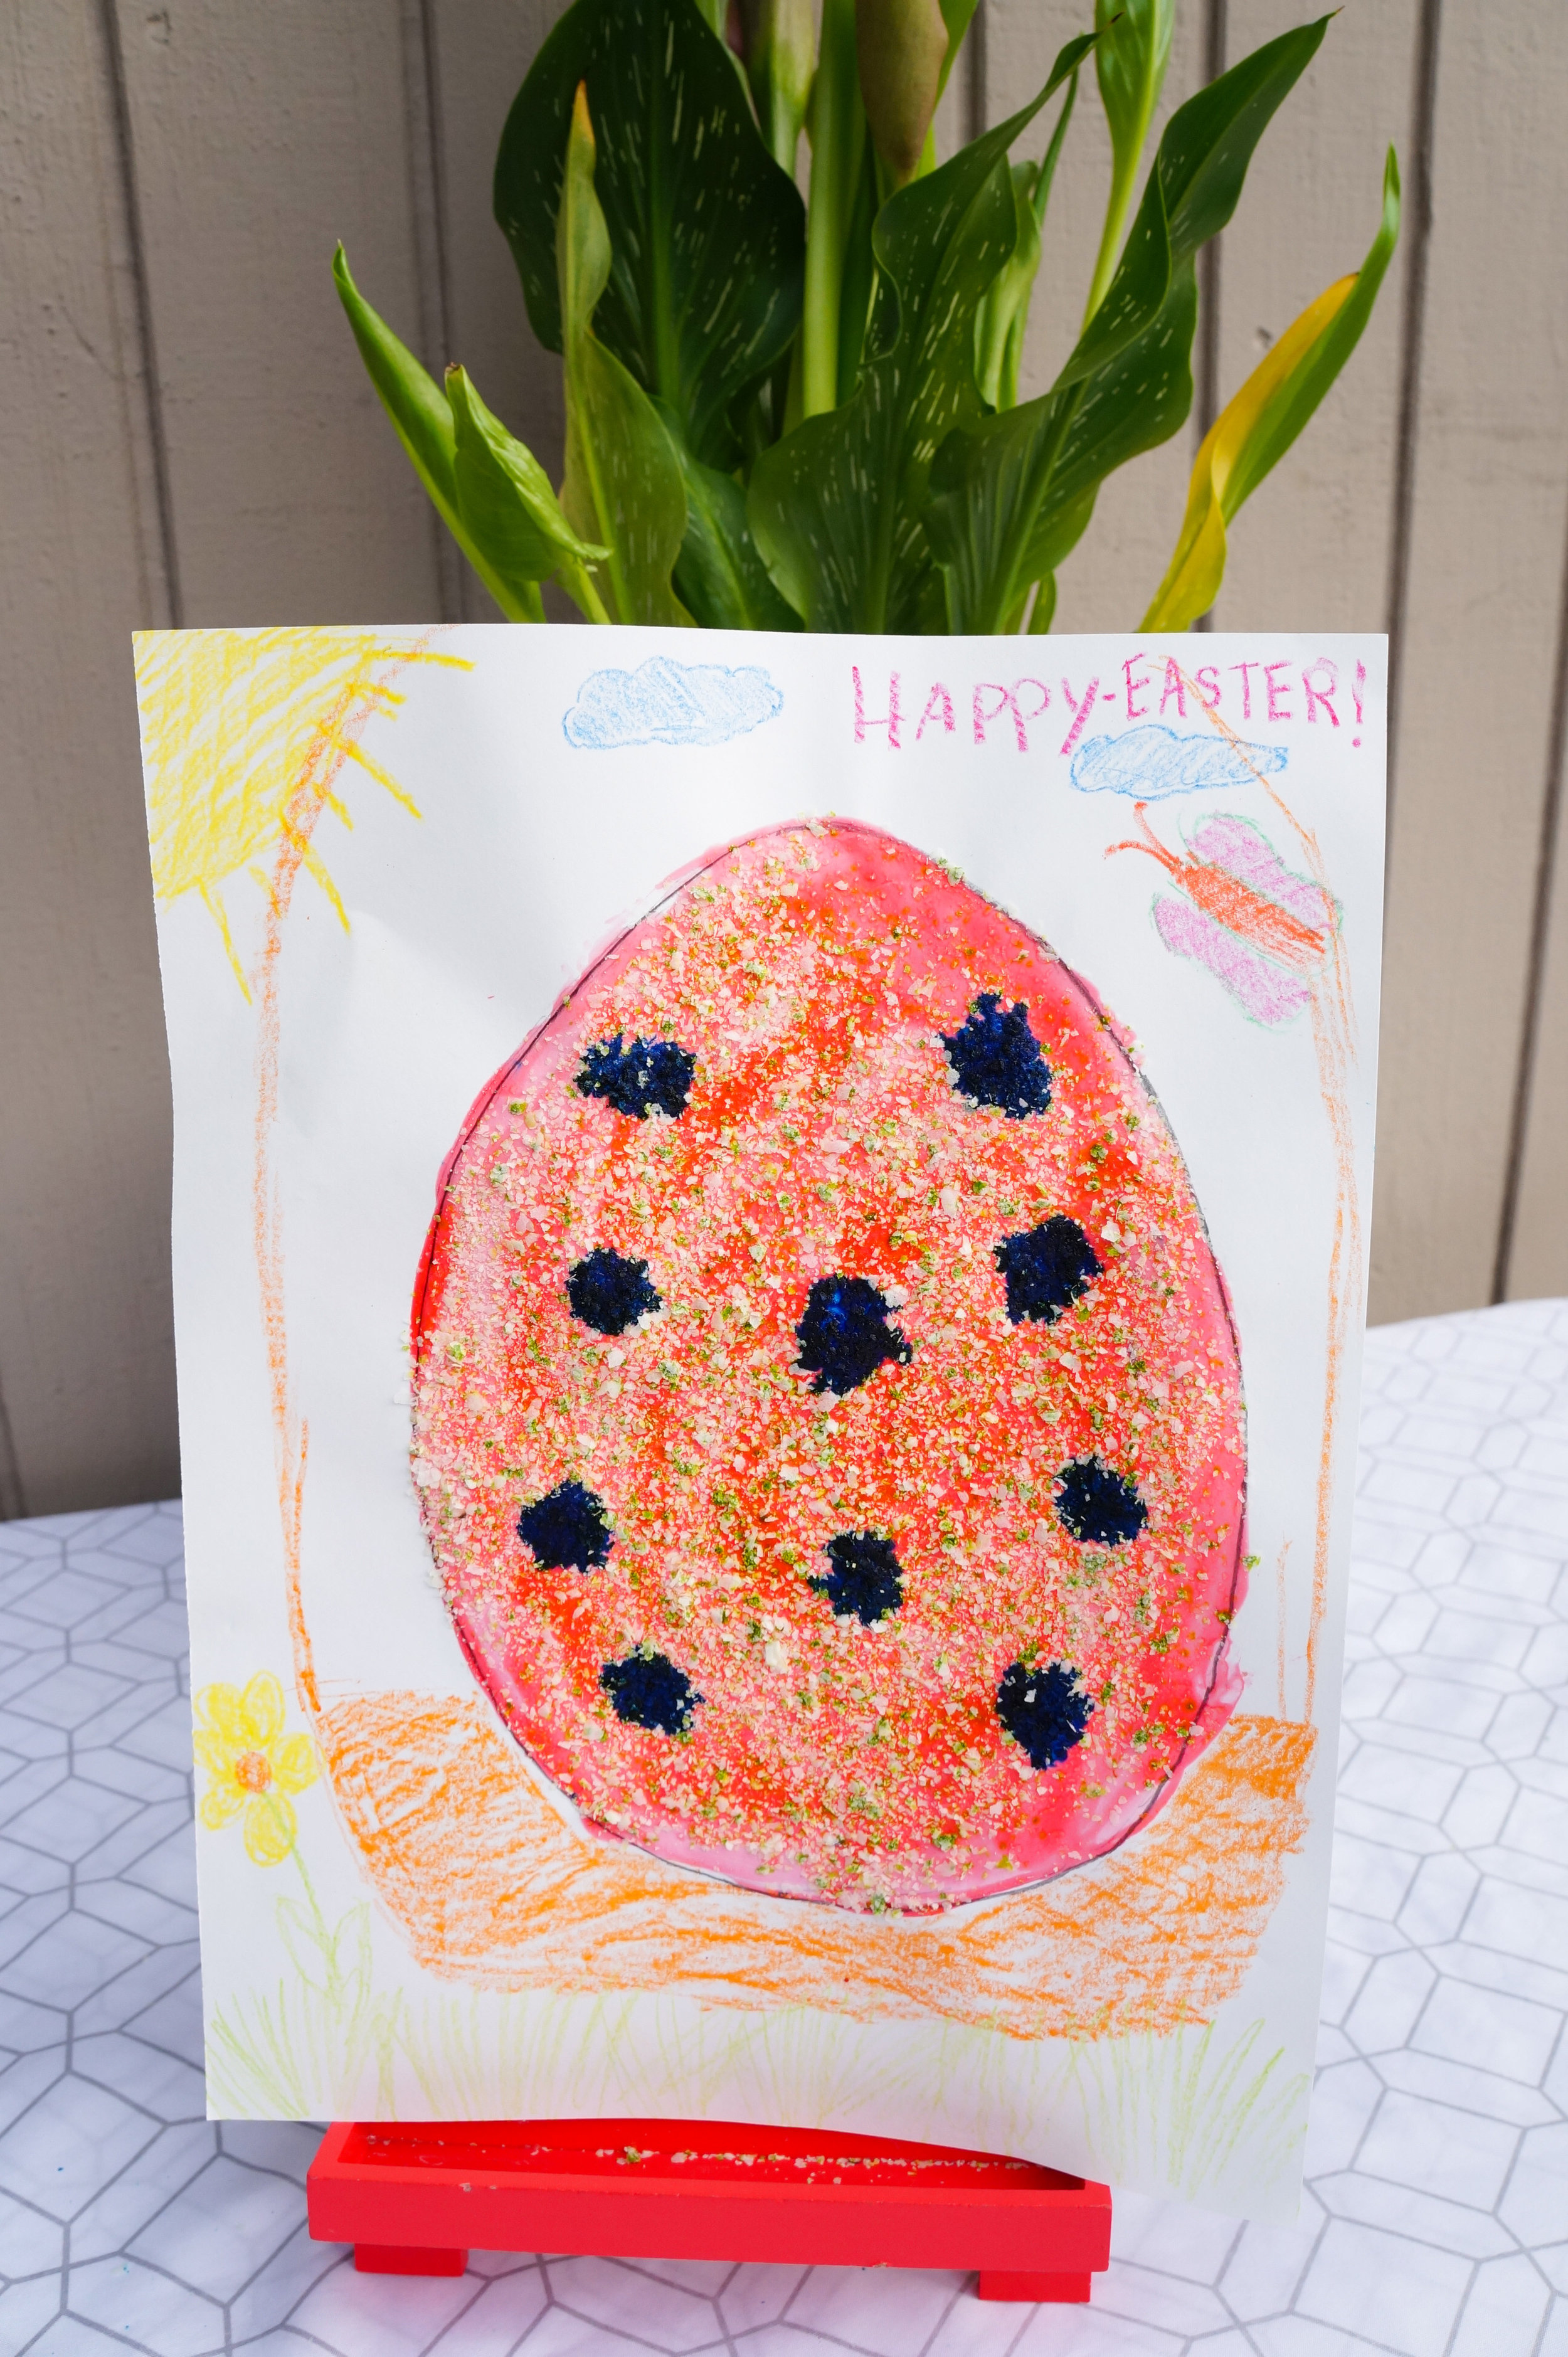 DIY Granite Style Easter Eggs